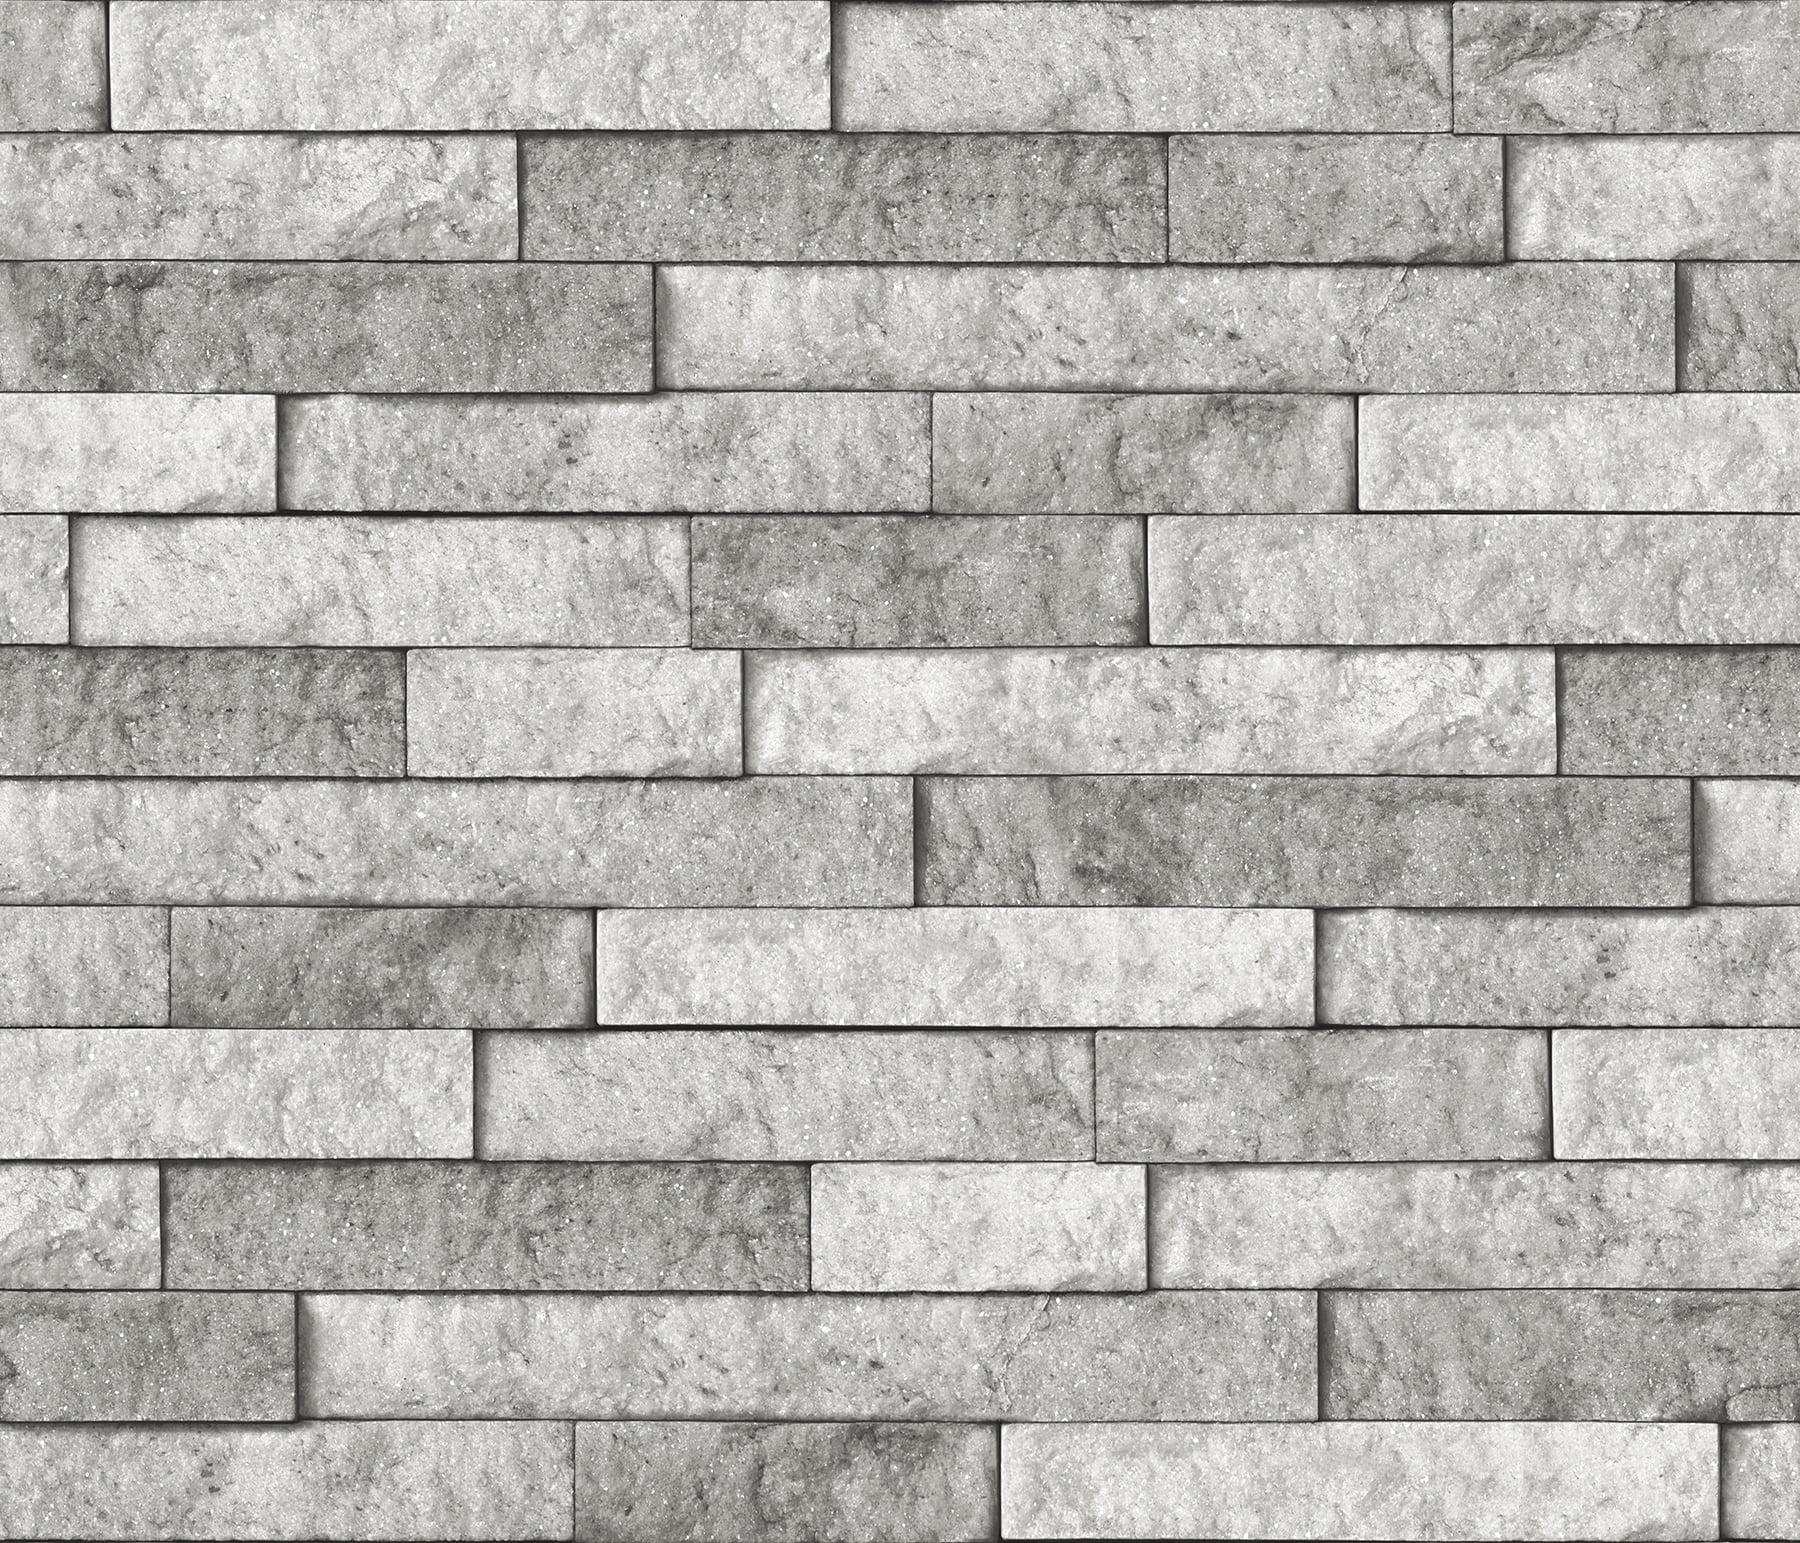 - Brewster Grey Stone Peel & Stick Backsplash - Walmart.com - Walmart.com